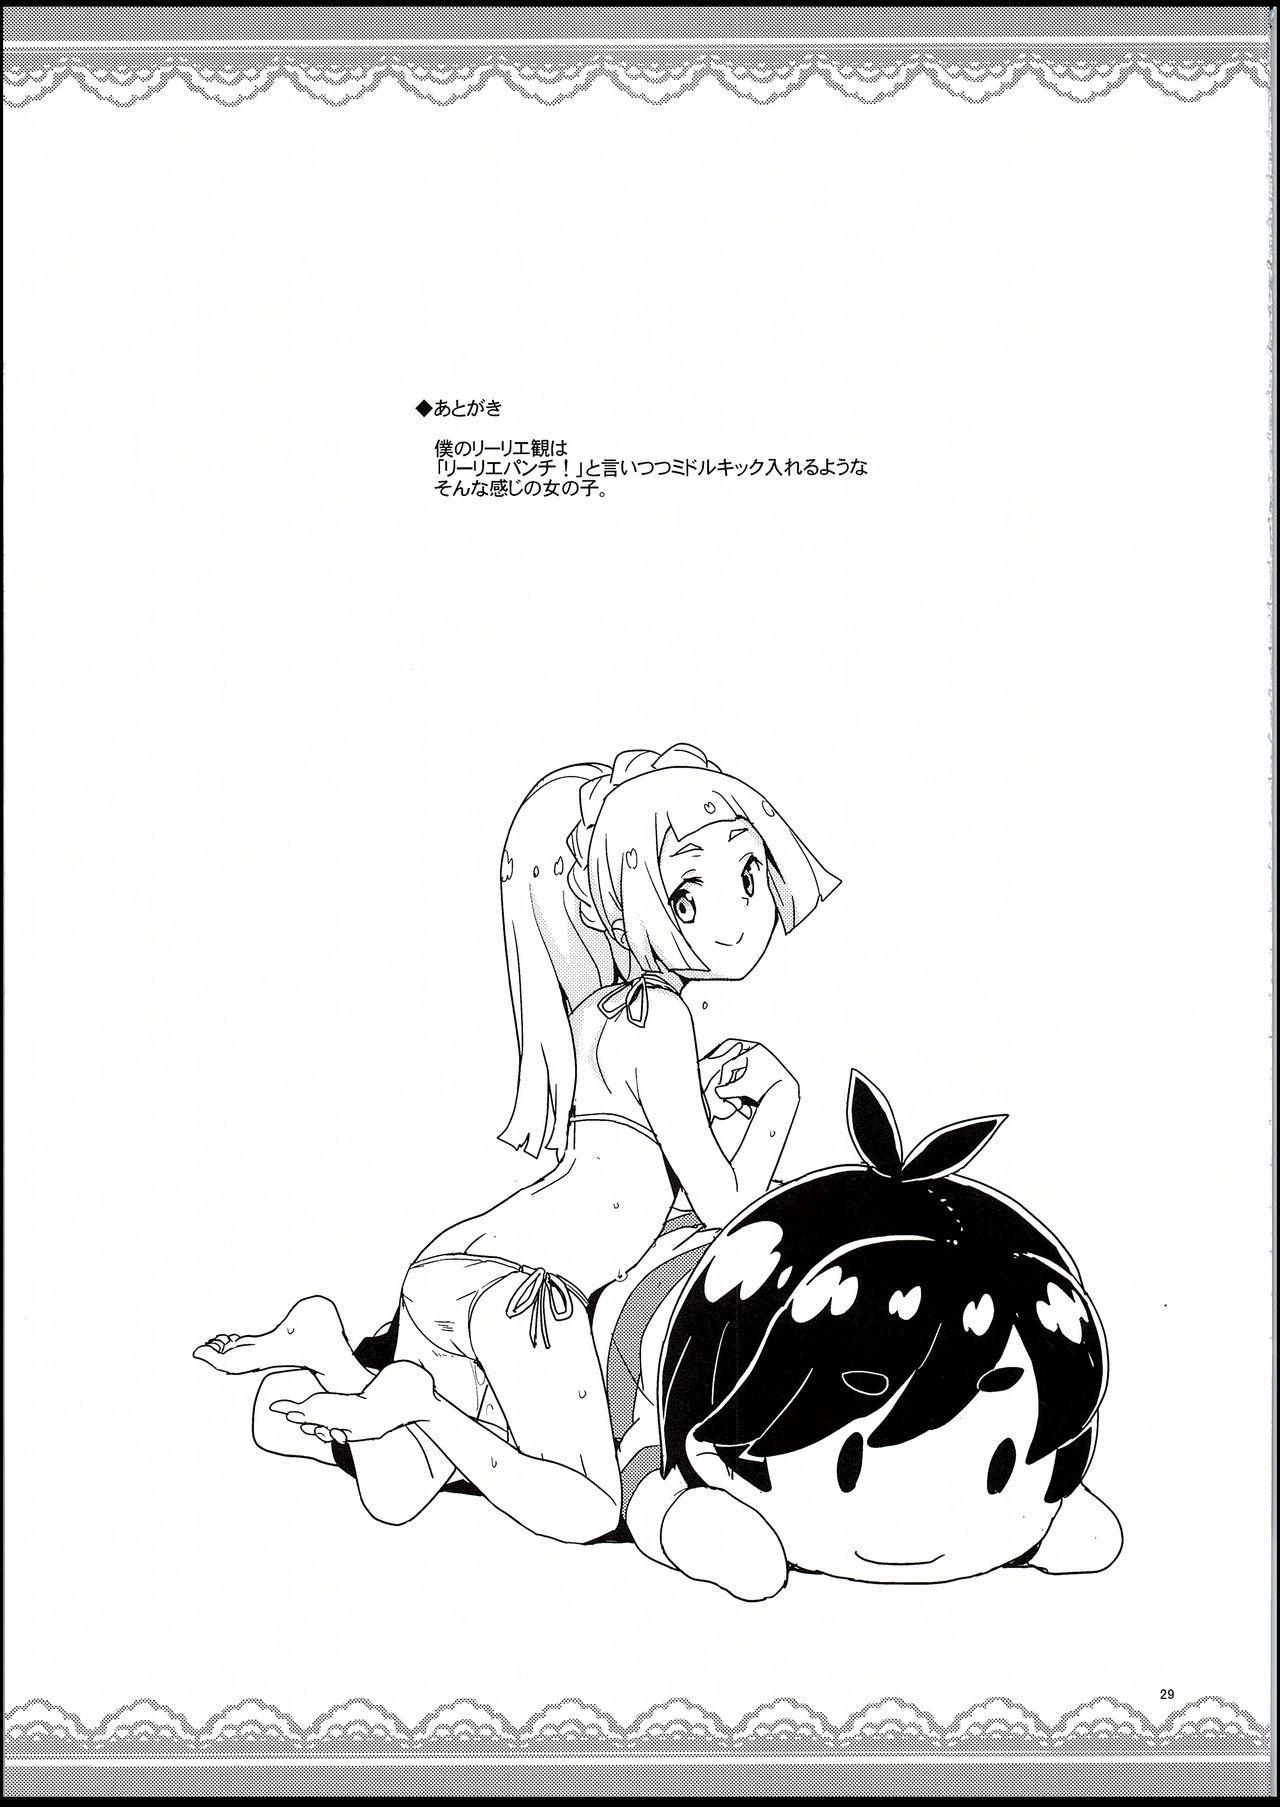 Lillie to Sun no Saimin Daisakusen - Lillie and Sun's Hypnotized Campaign 27